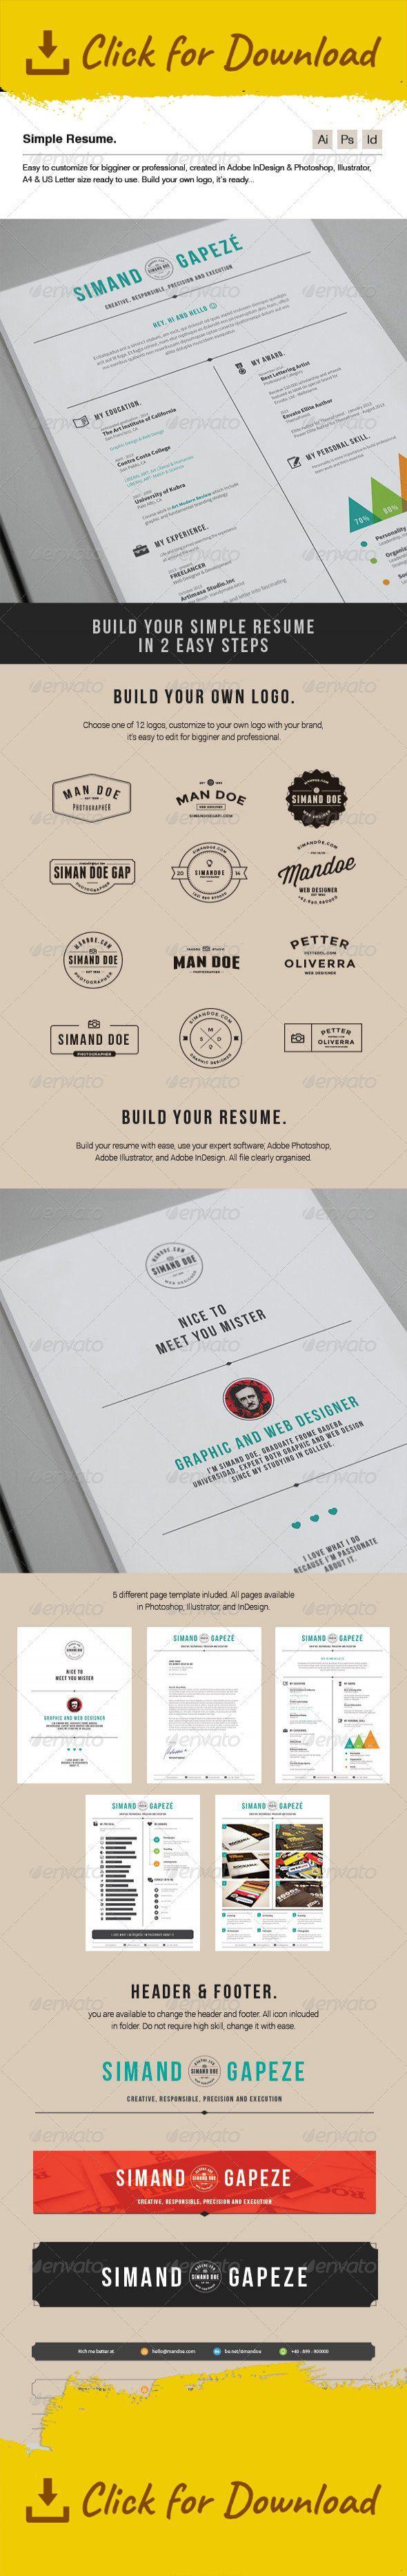 clean cover letter creative template curriculum vitae